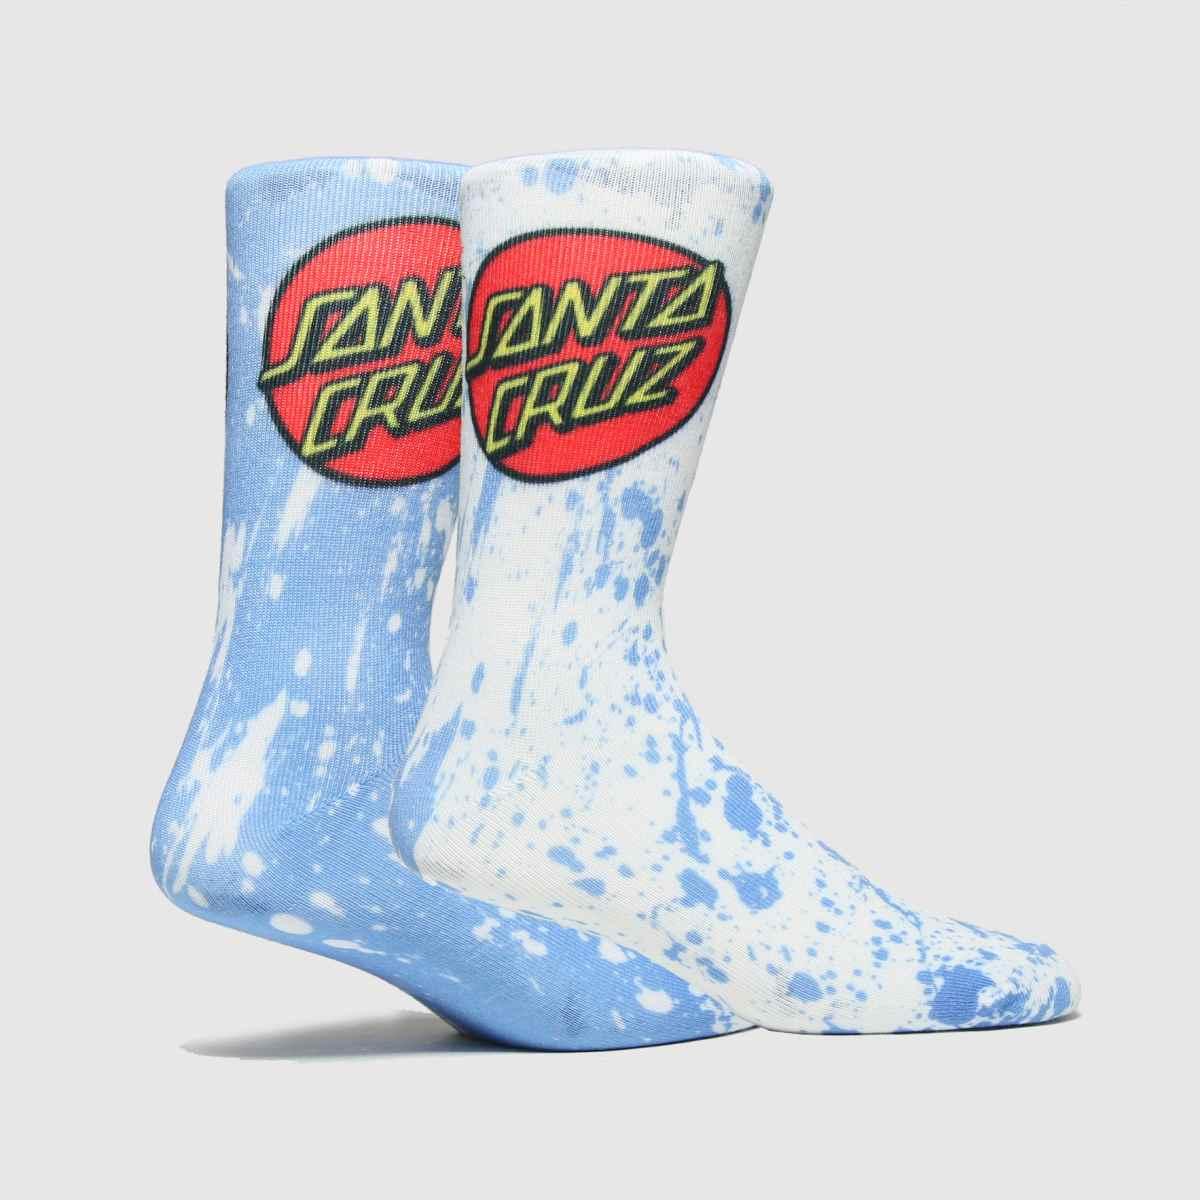 Santa Cruz Accessories Santa Cruz White & Pl Blue Kit Sock 2pk